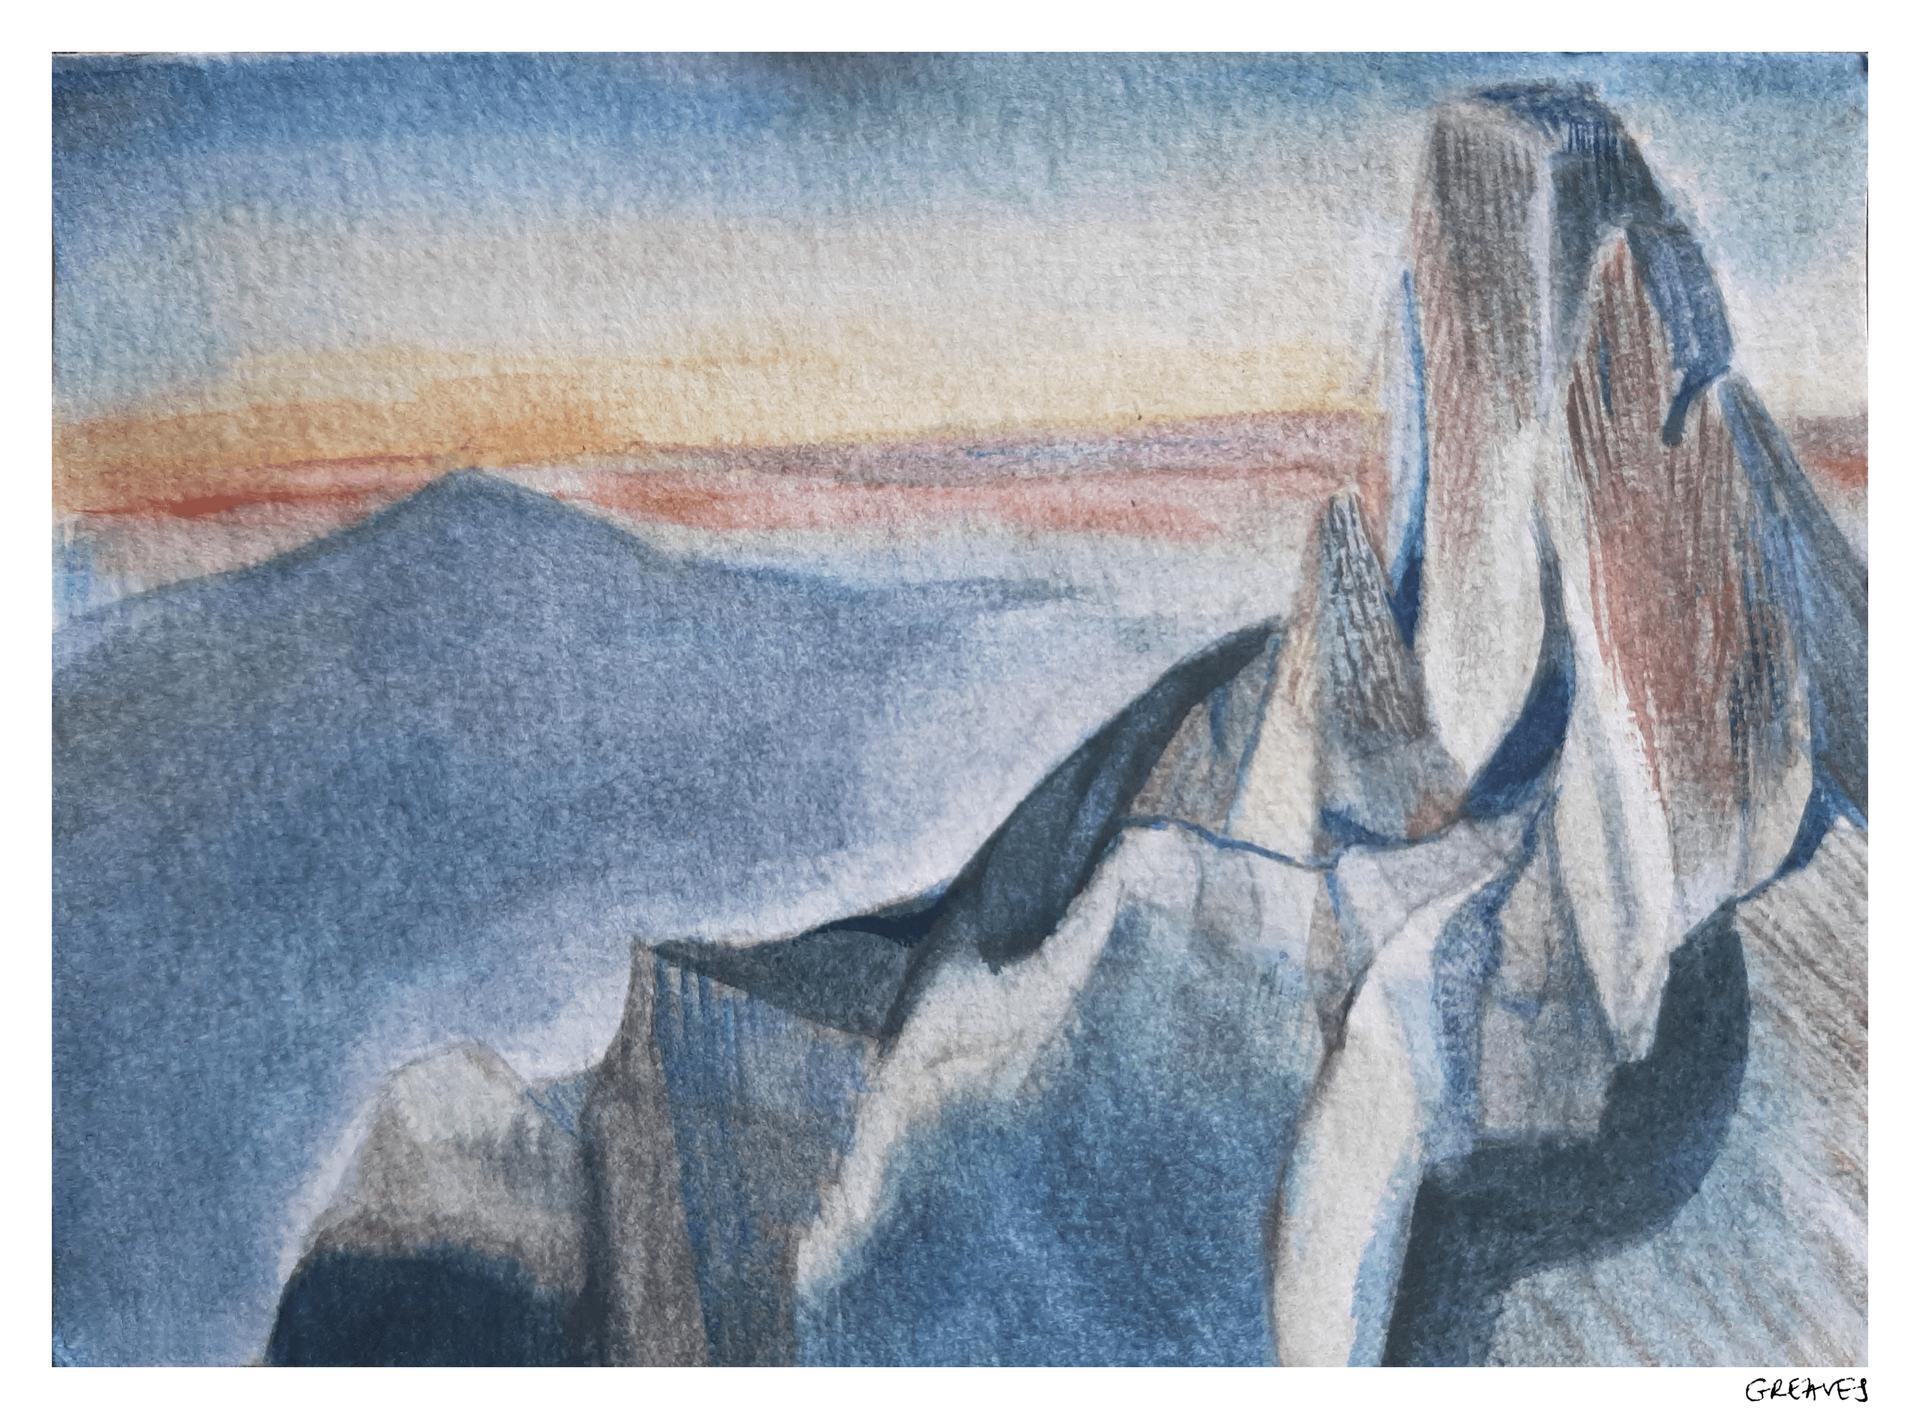 Dolomite Illustrations